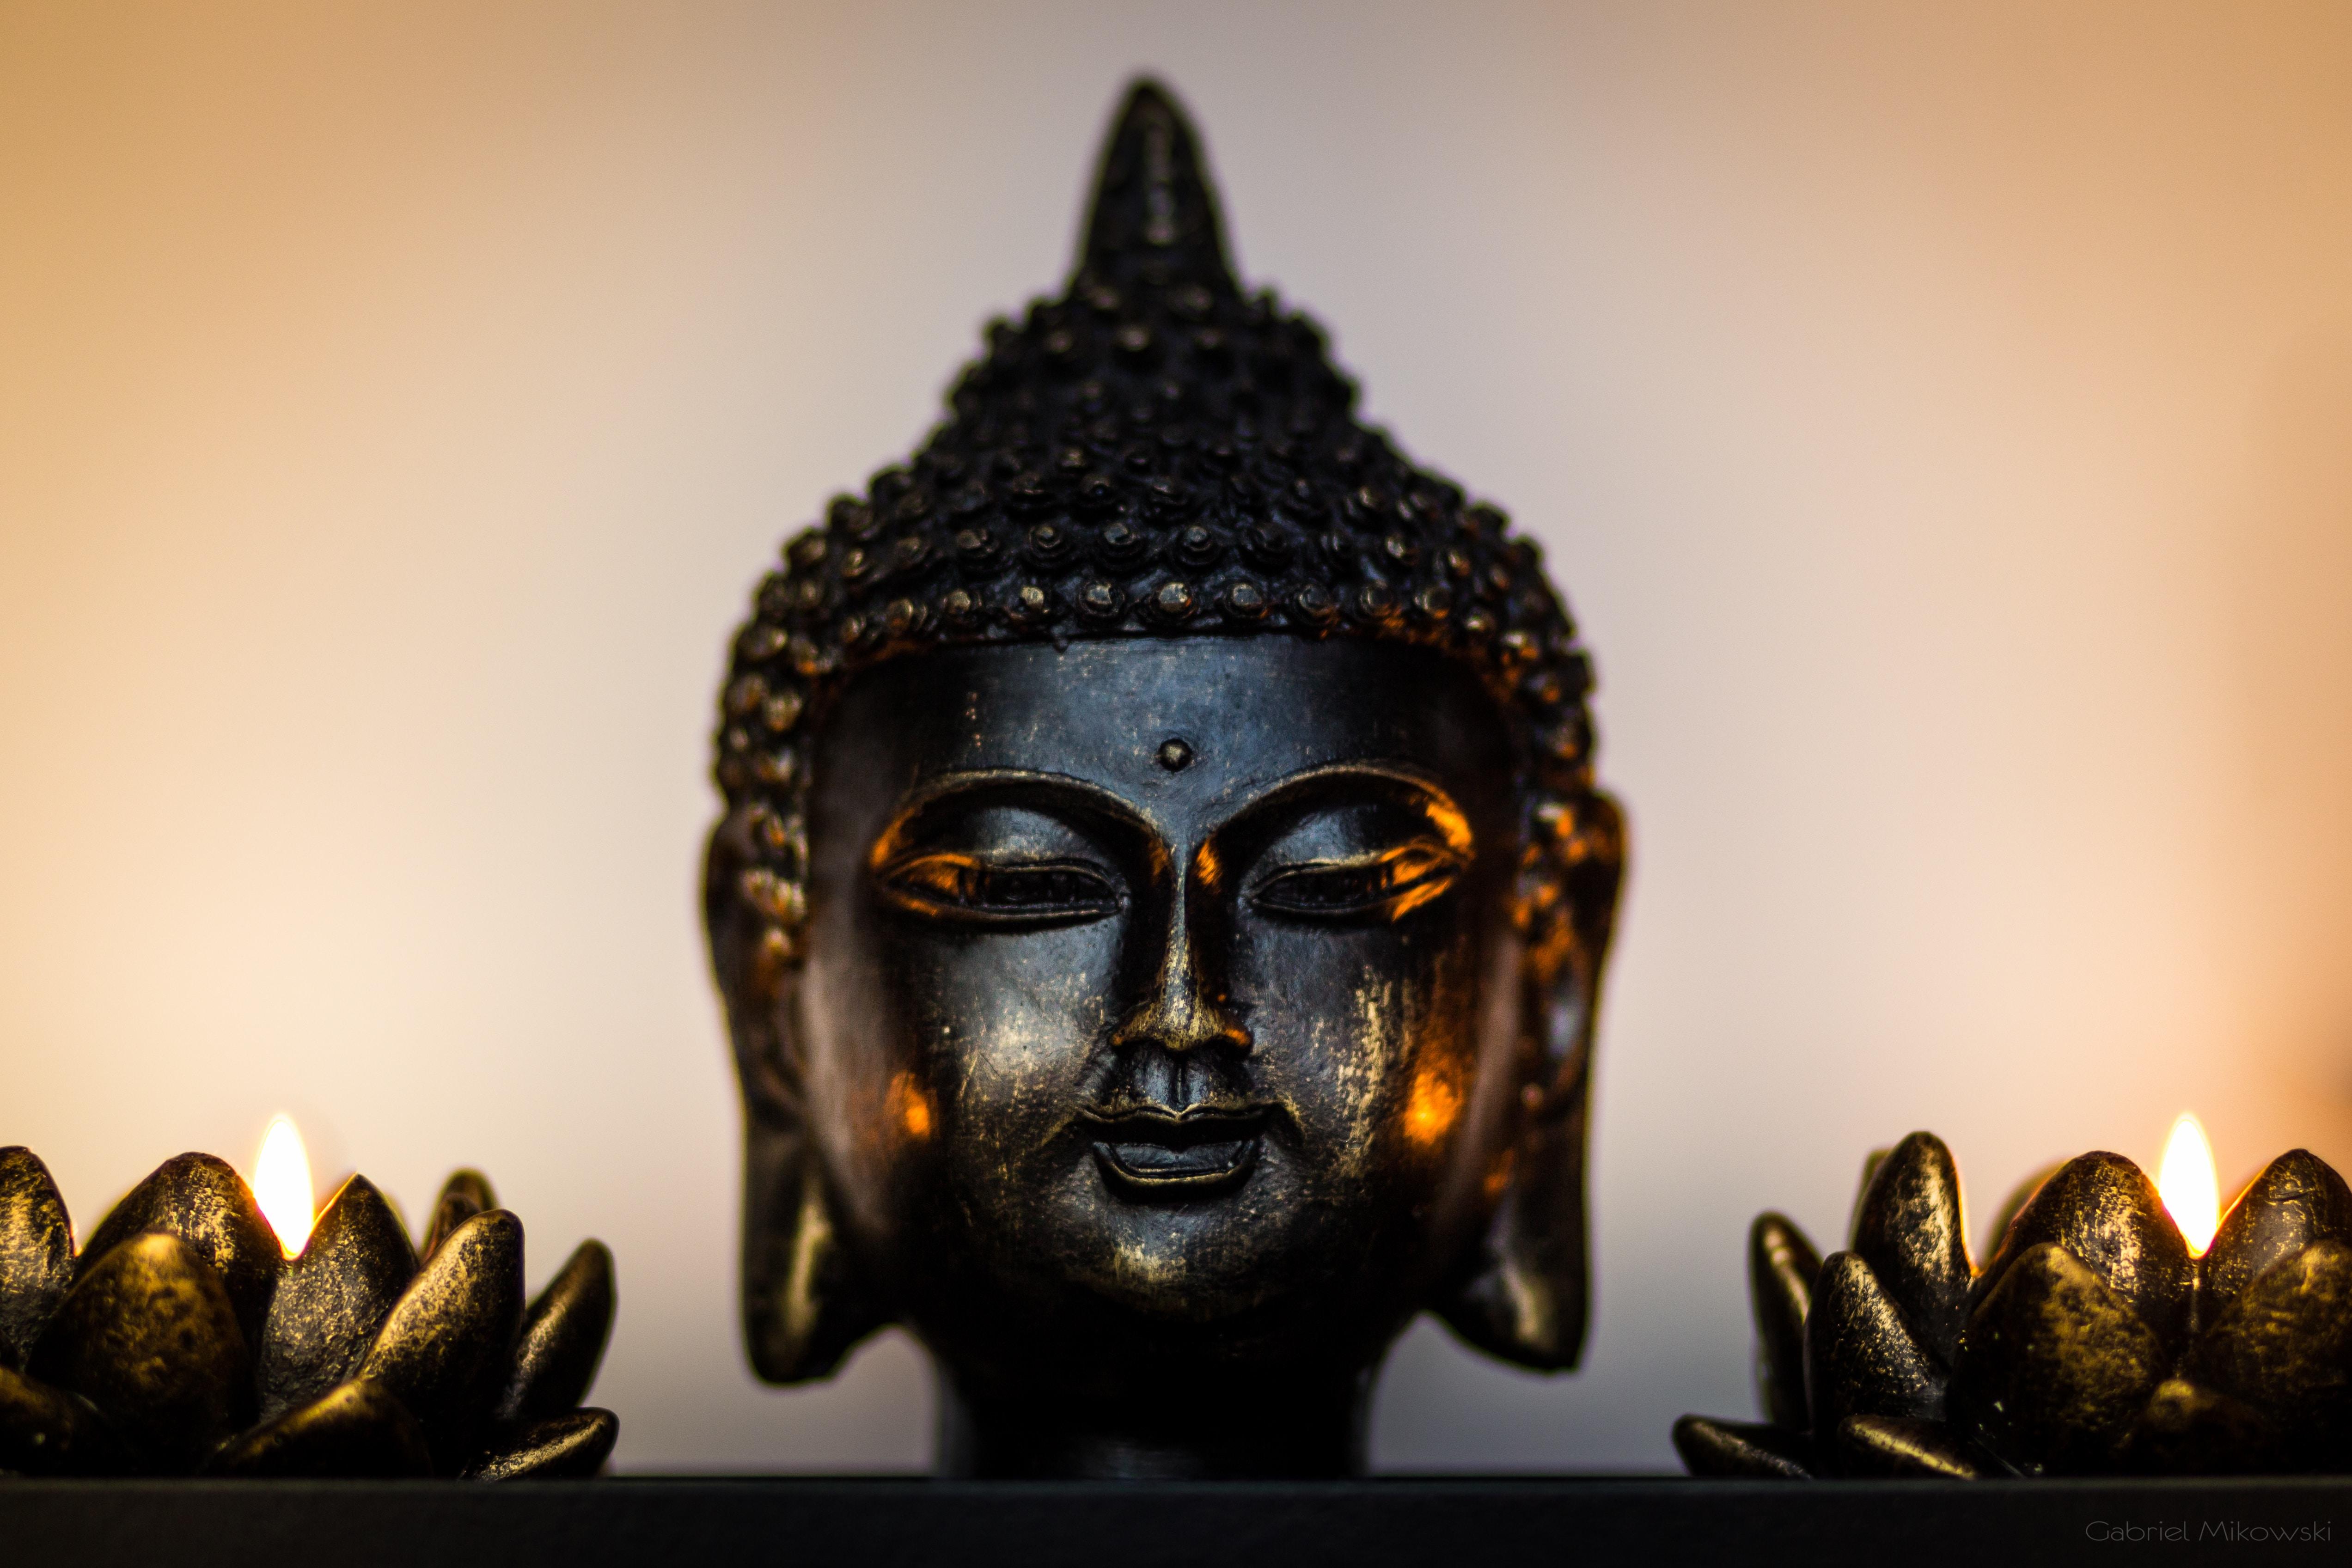 Mantra sound healing